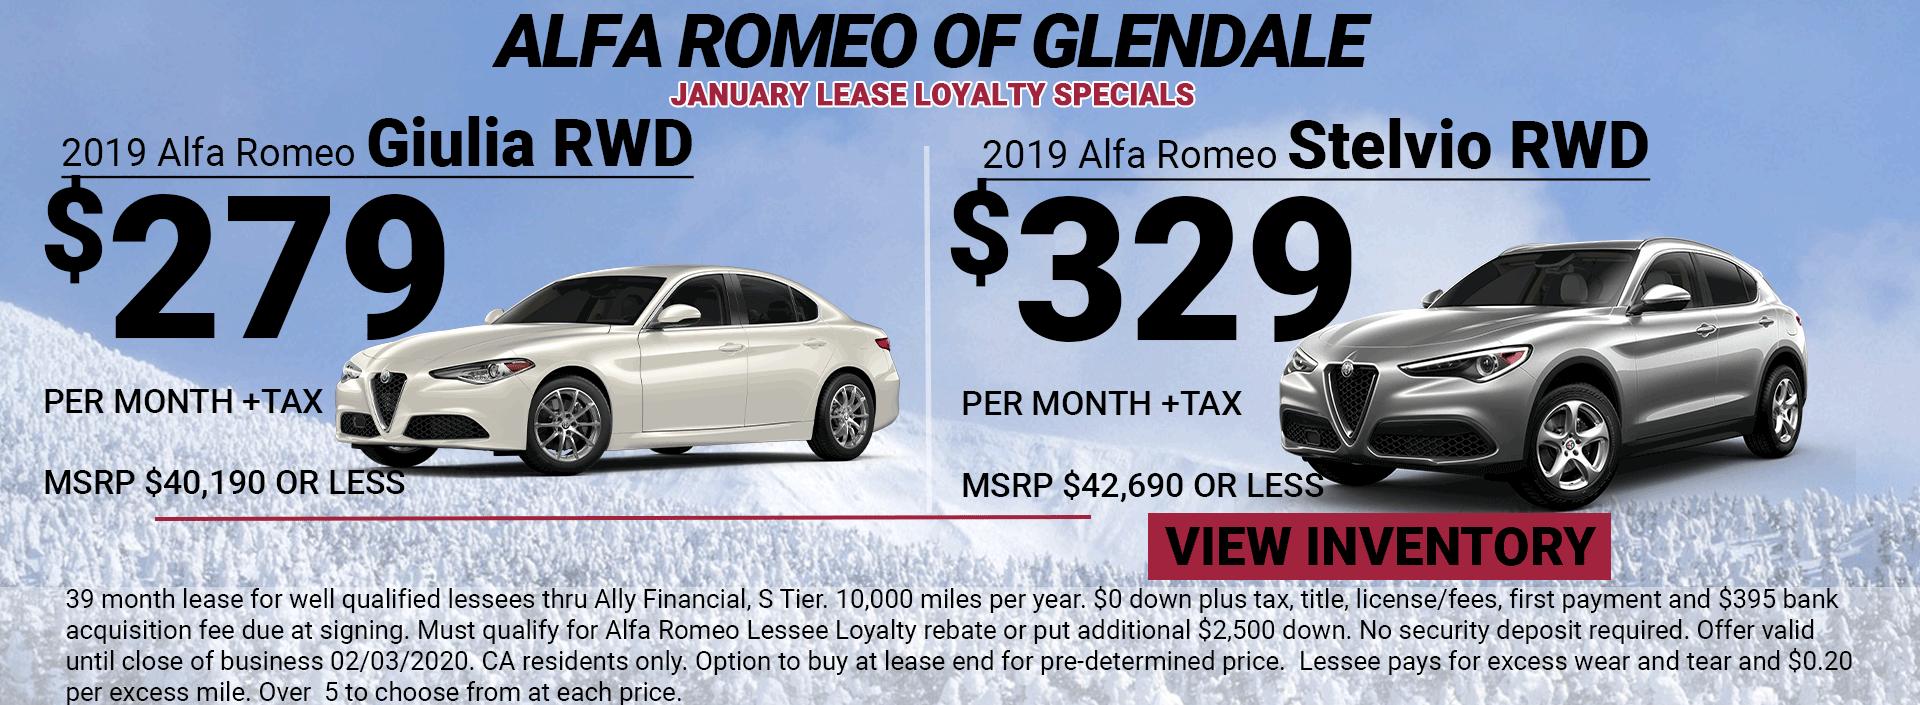 Alfa Romeo of Glendale